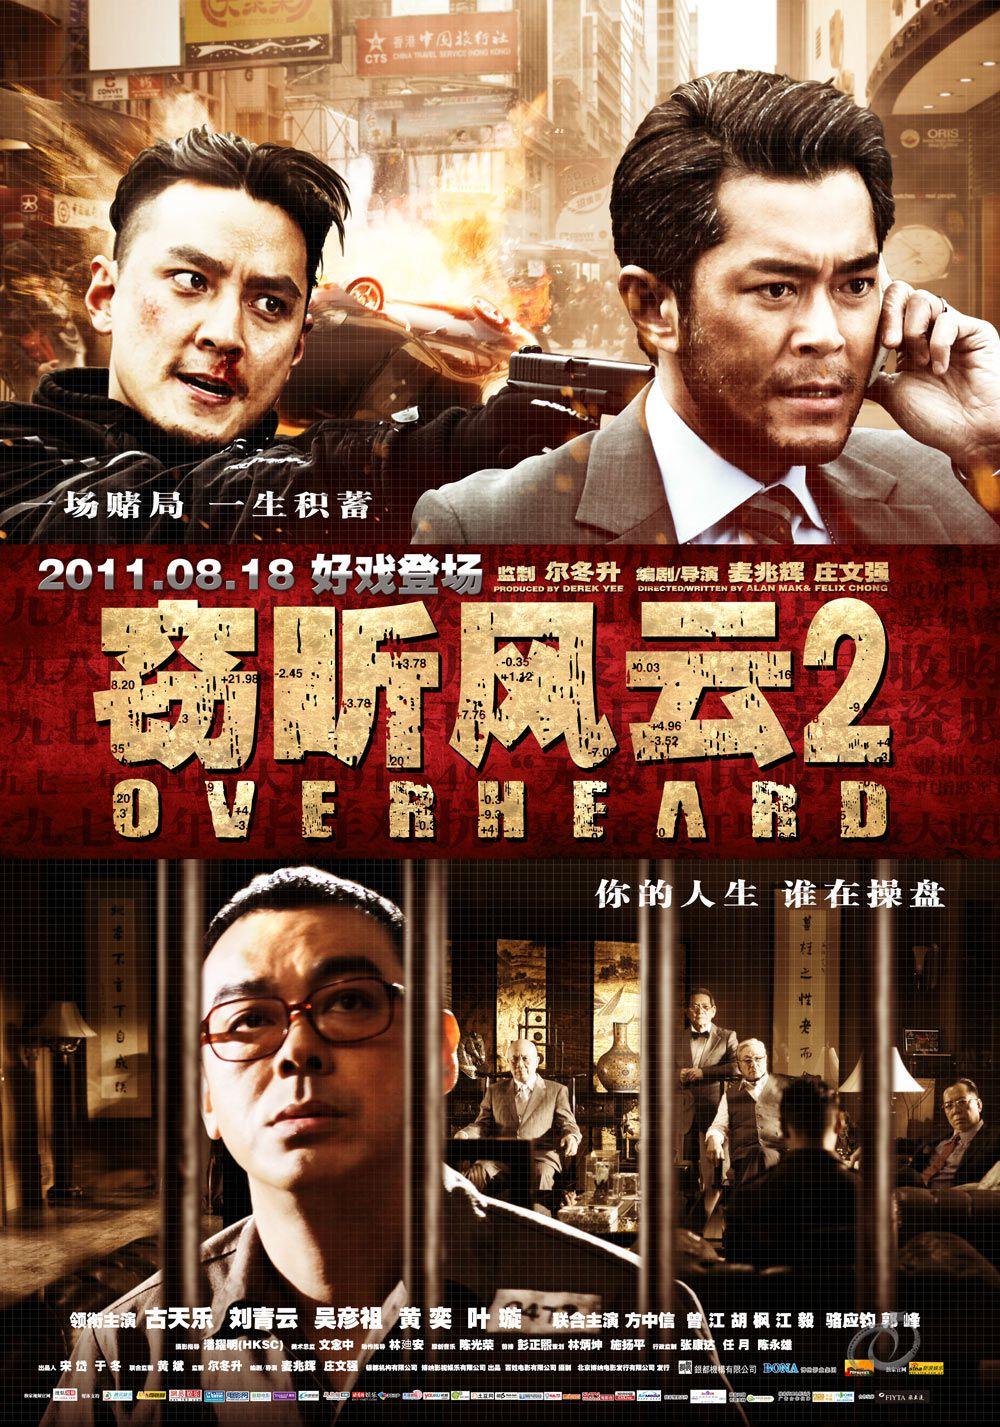 Overheard 2 - Film (2011)